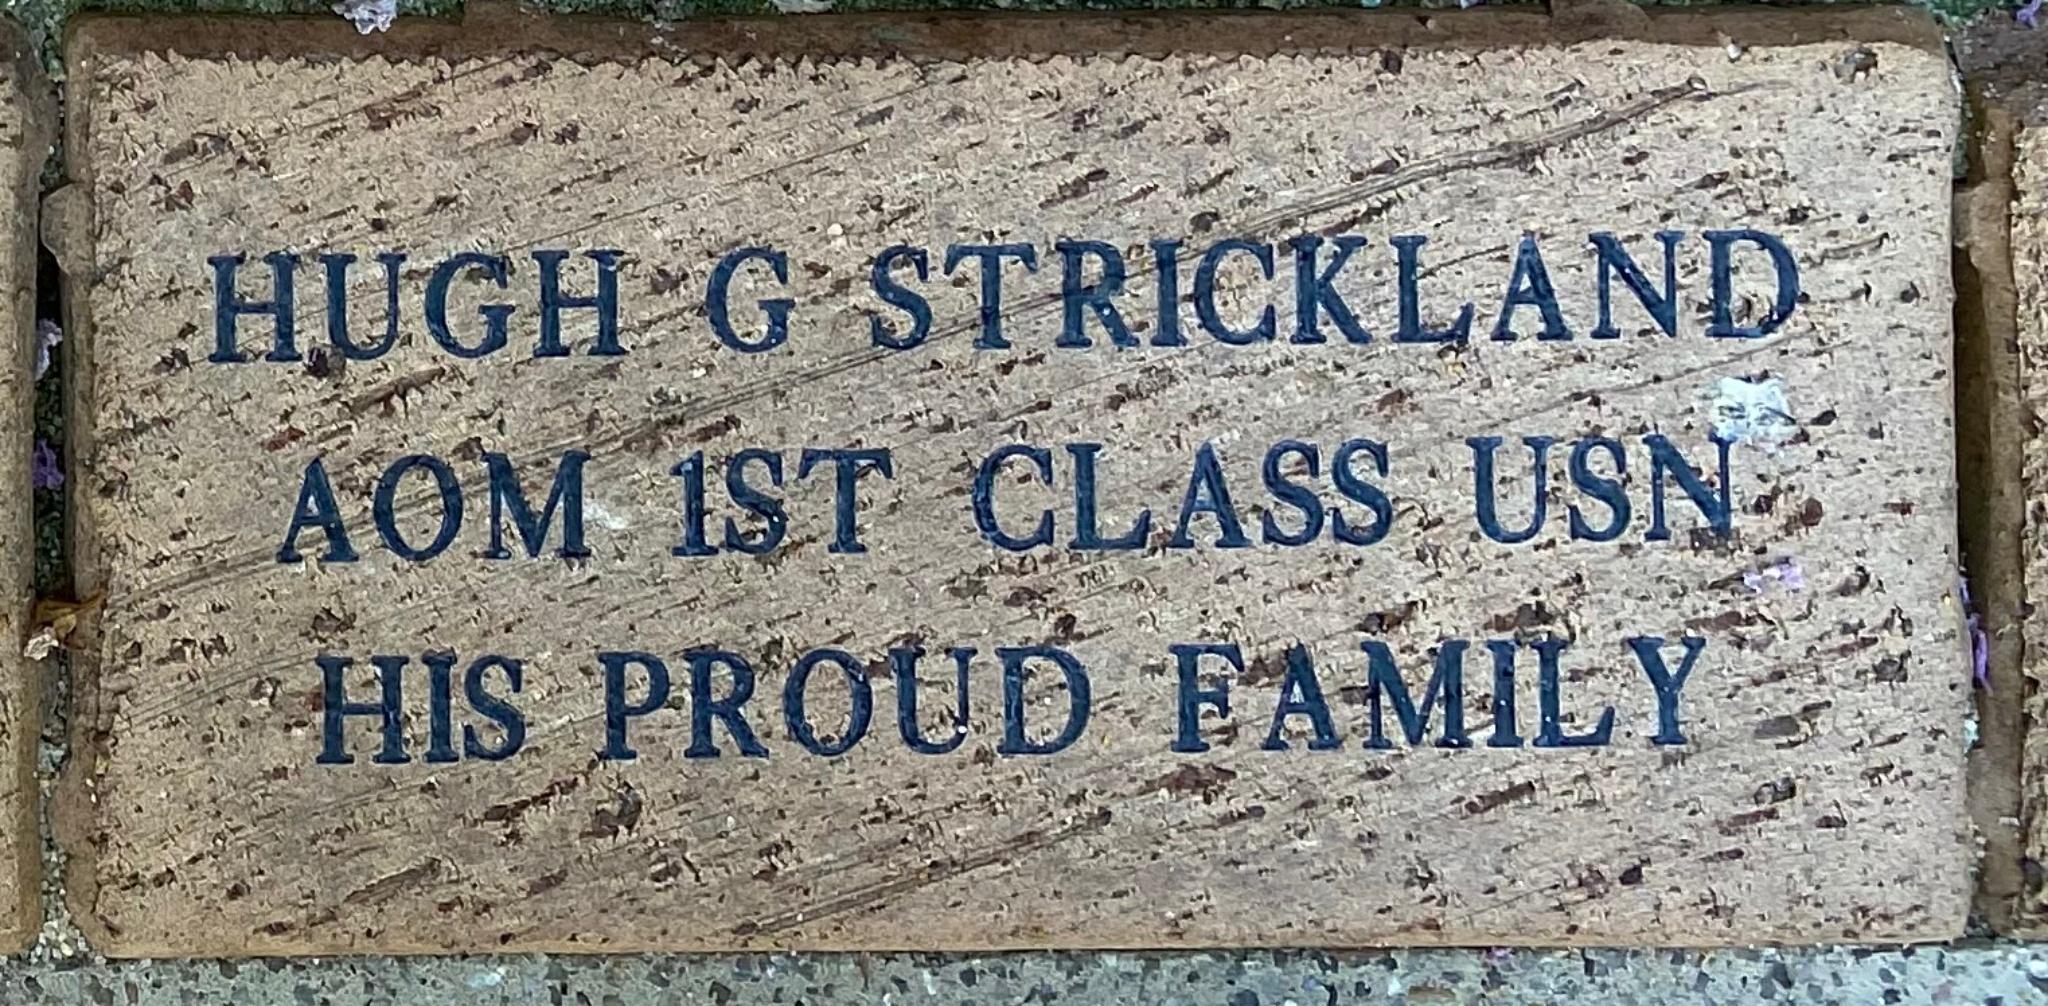 HUGH G STRICKLAND AOM 1ST CLASS USN HIS PROUD FAMILY